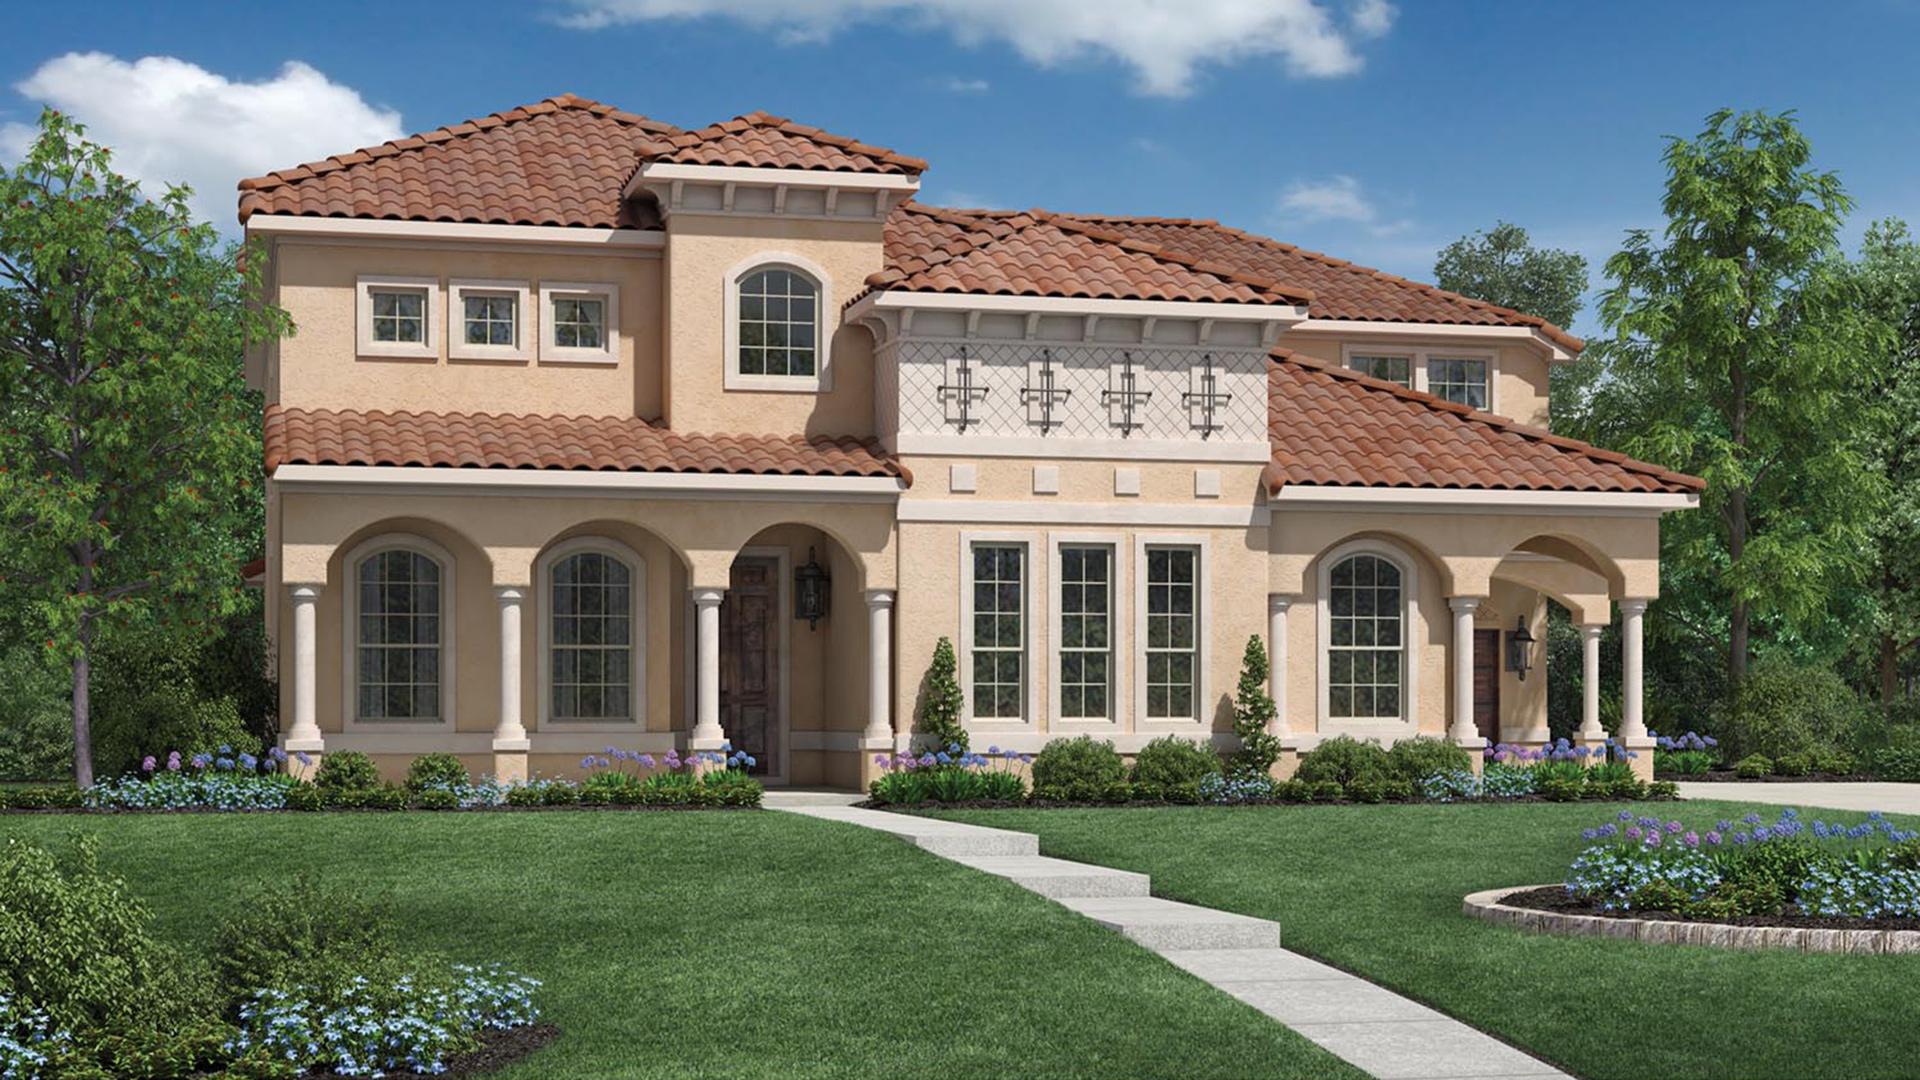 Star trail the avila home design for Star home designs